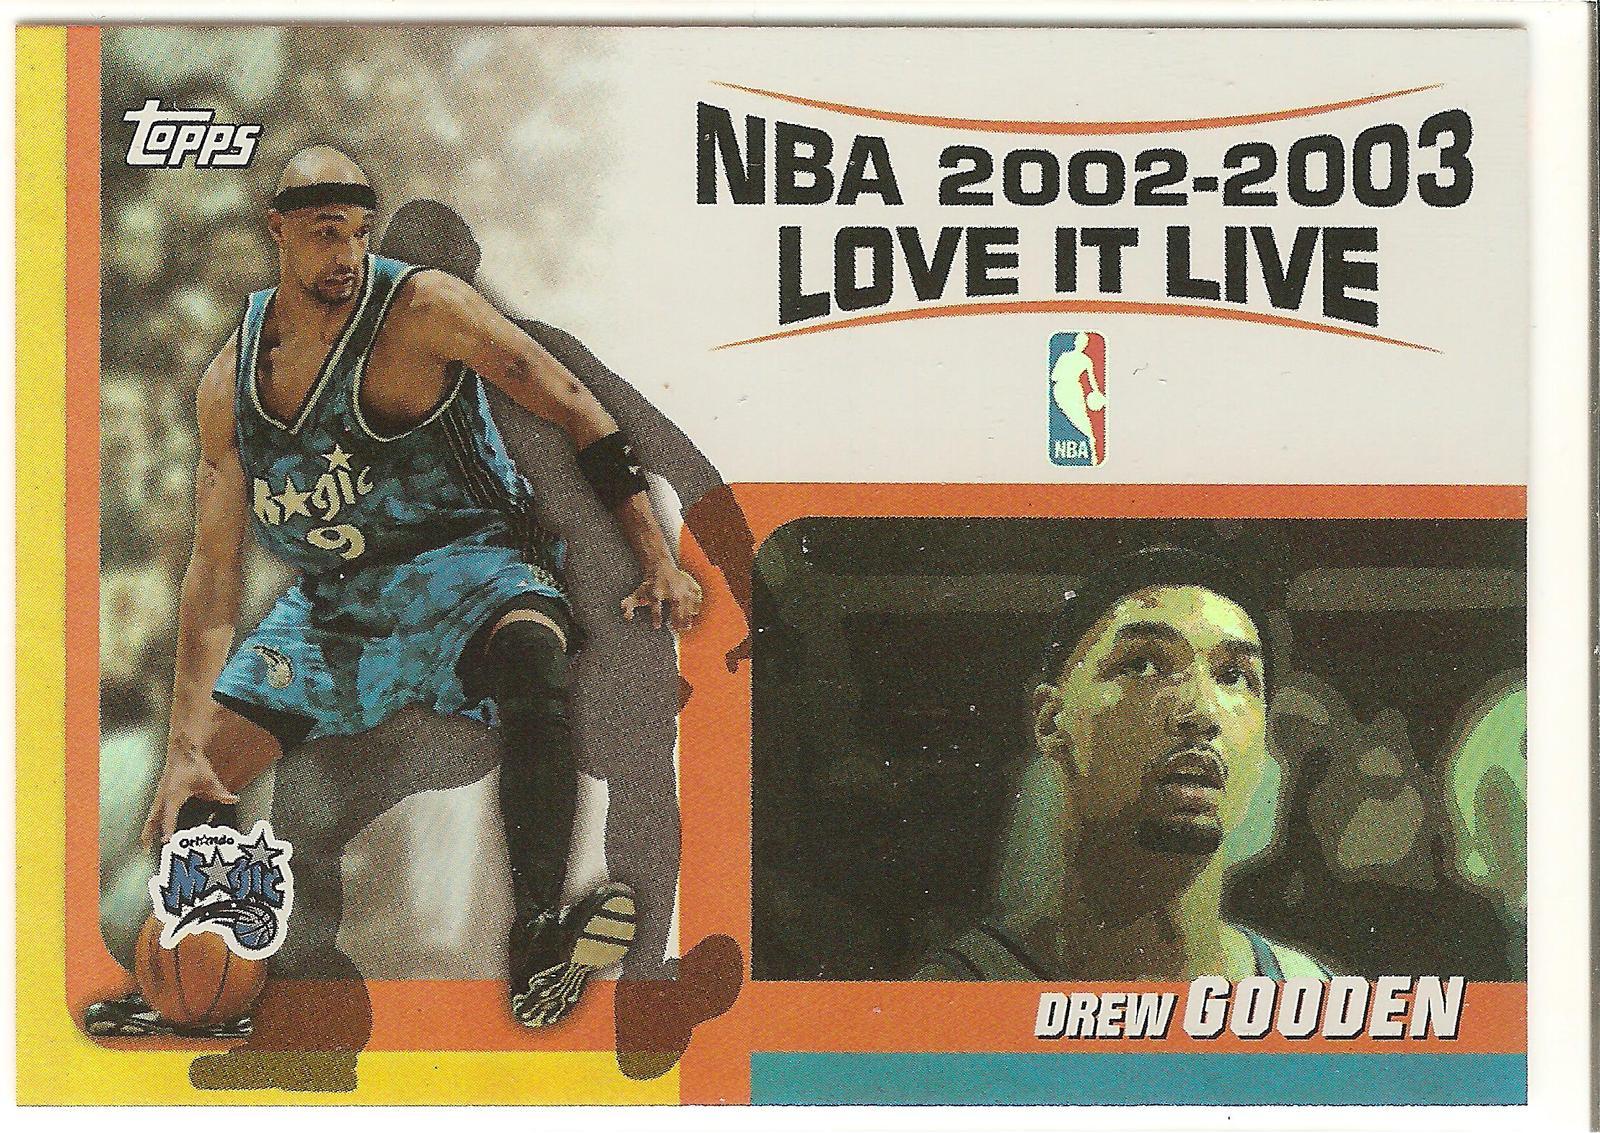 Drew gooden 001